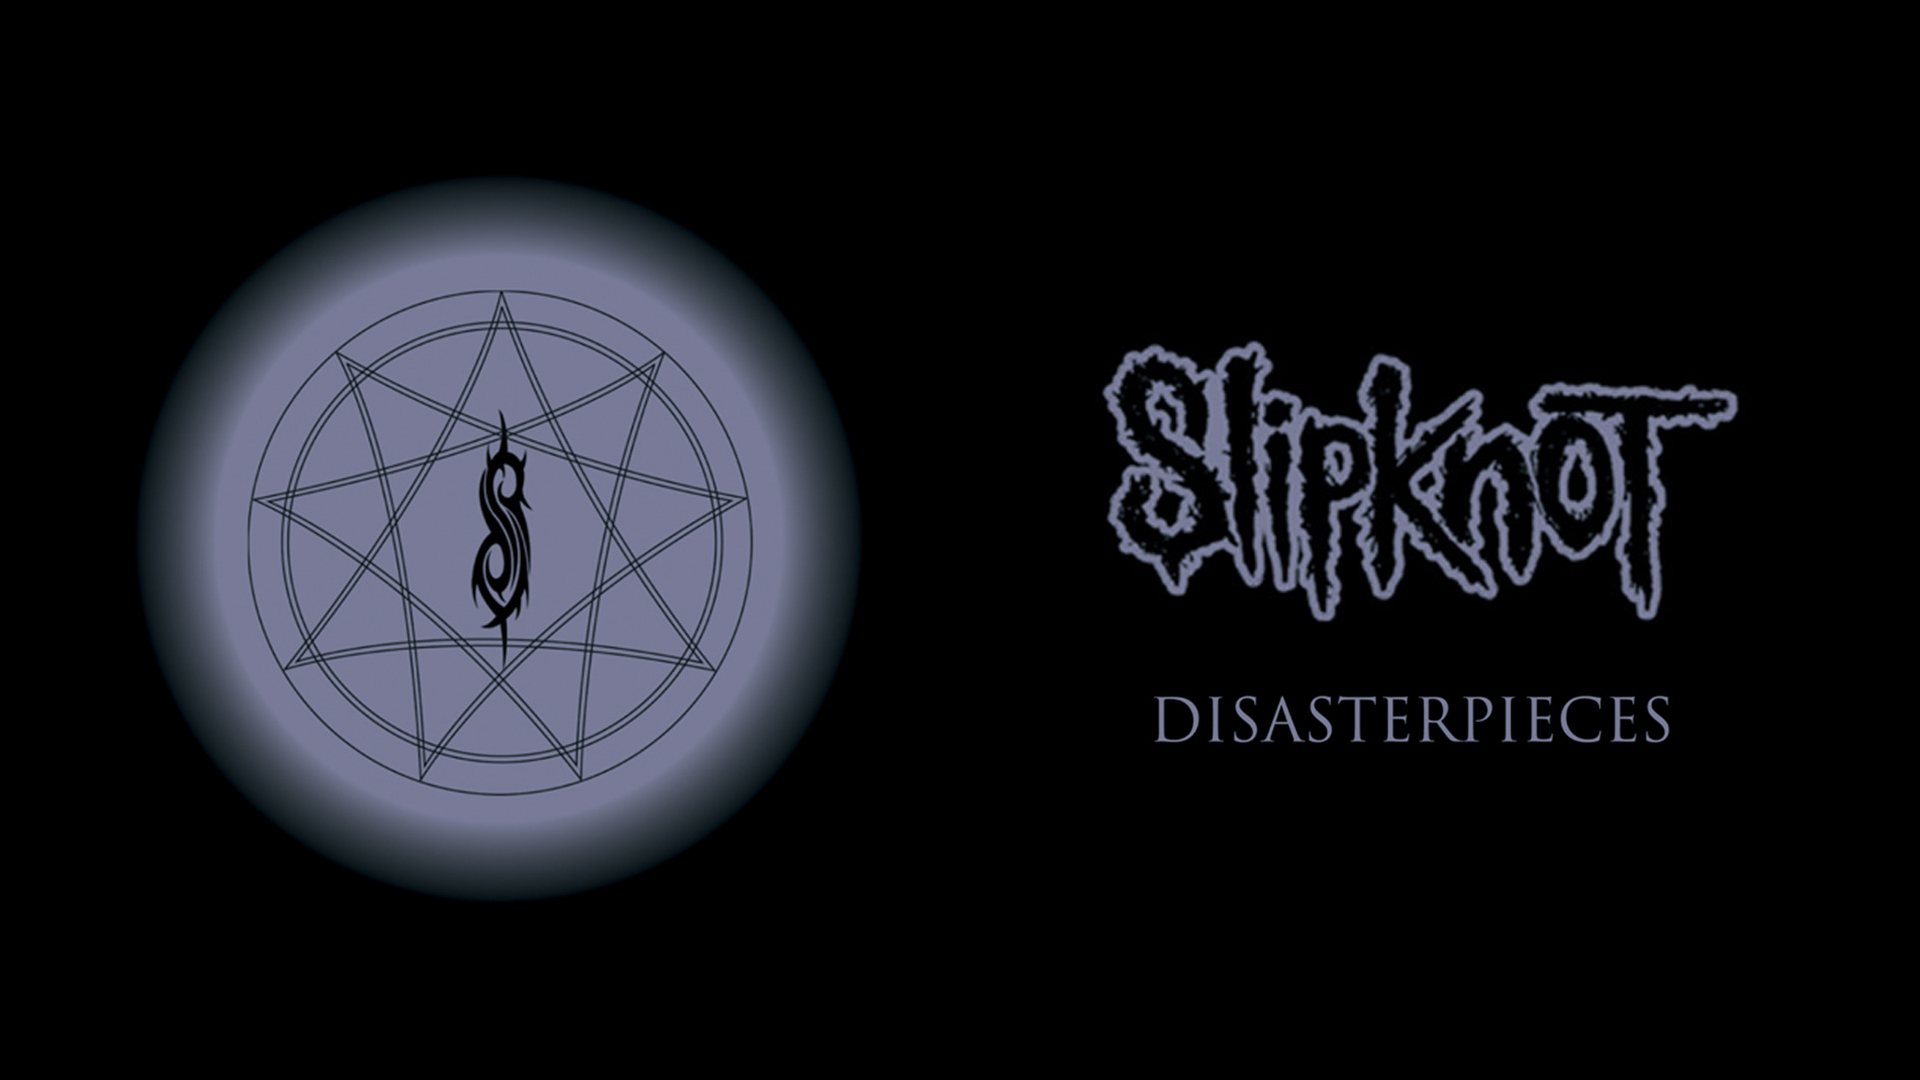 Slipknot Disasterpieces